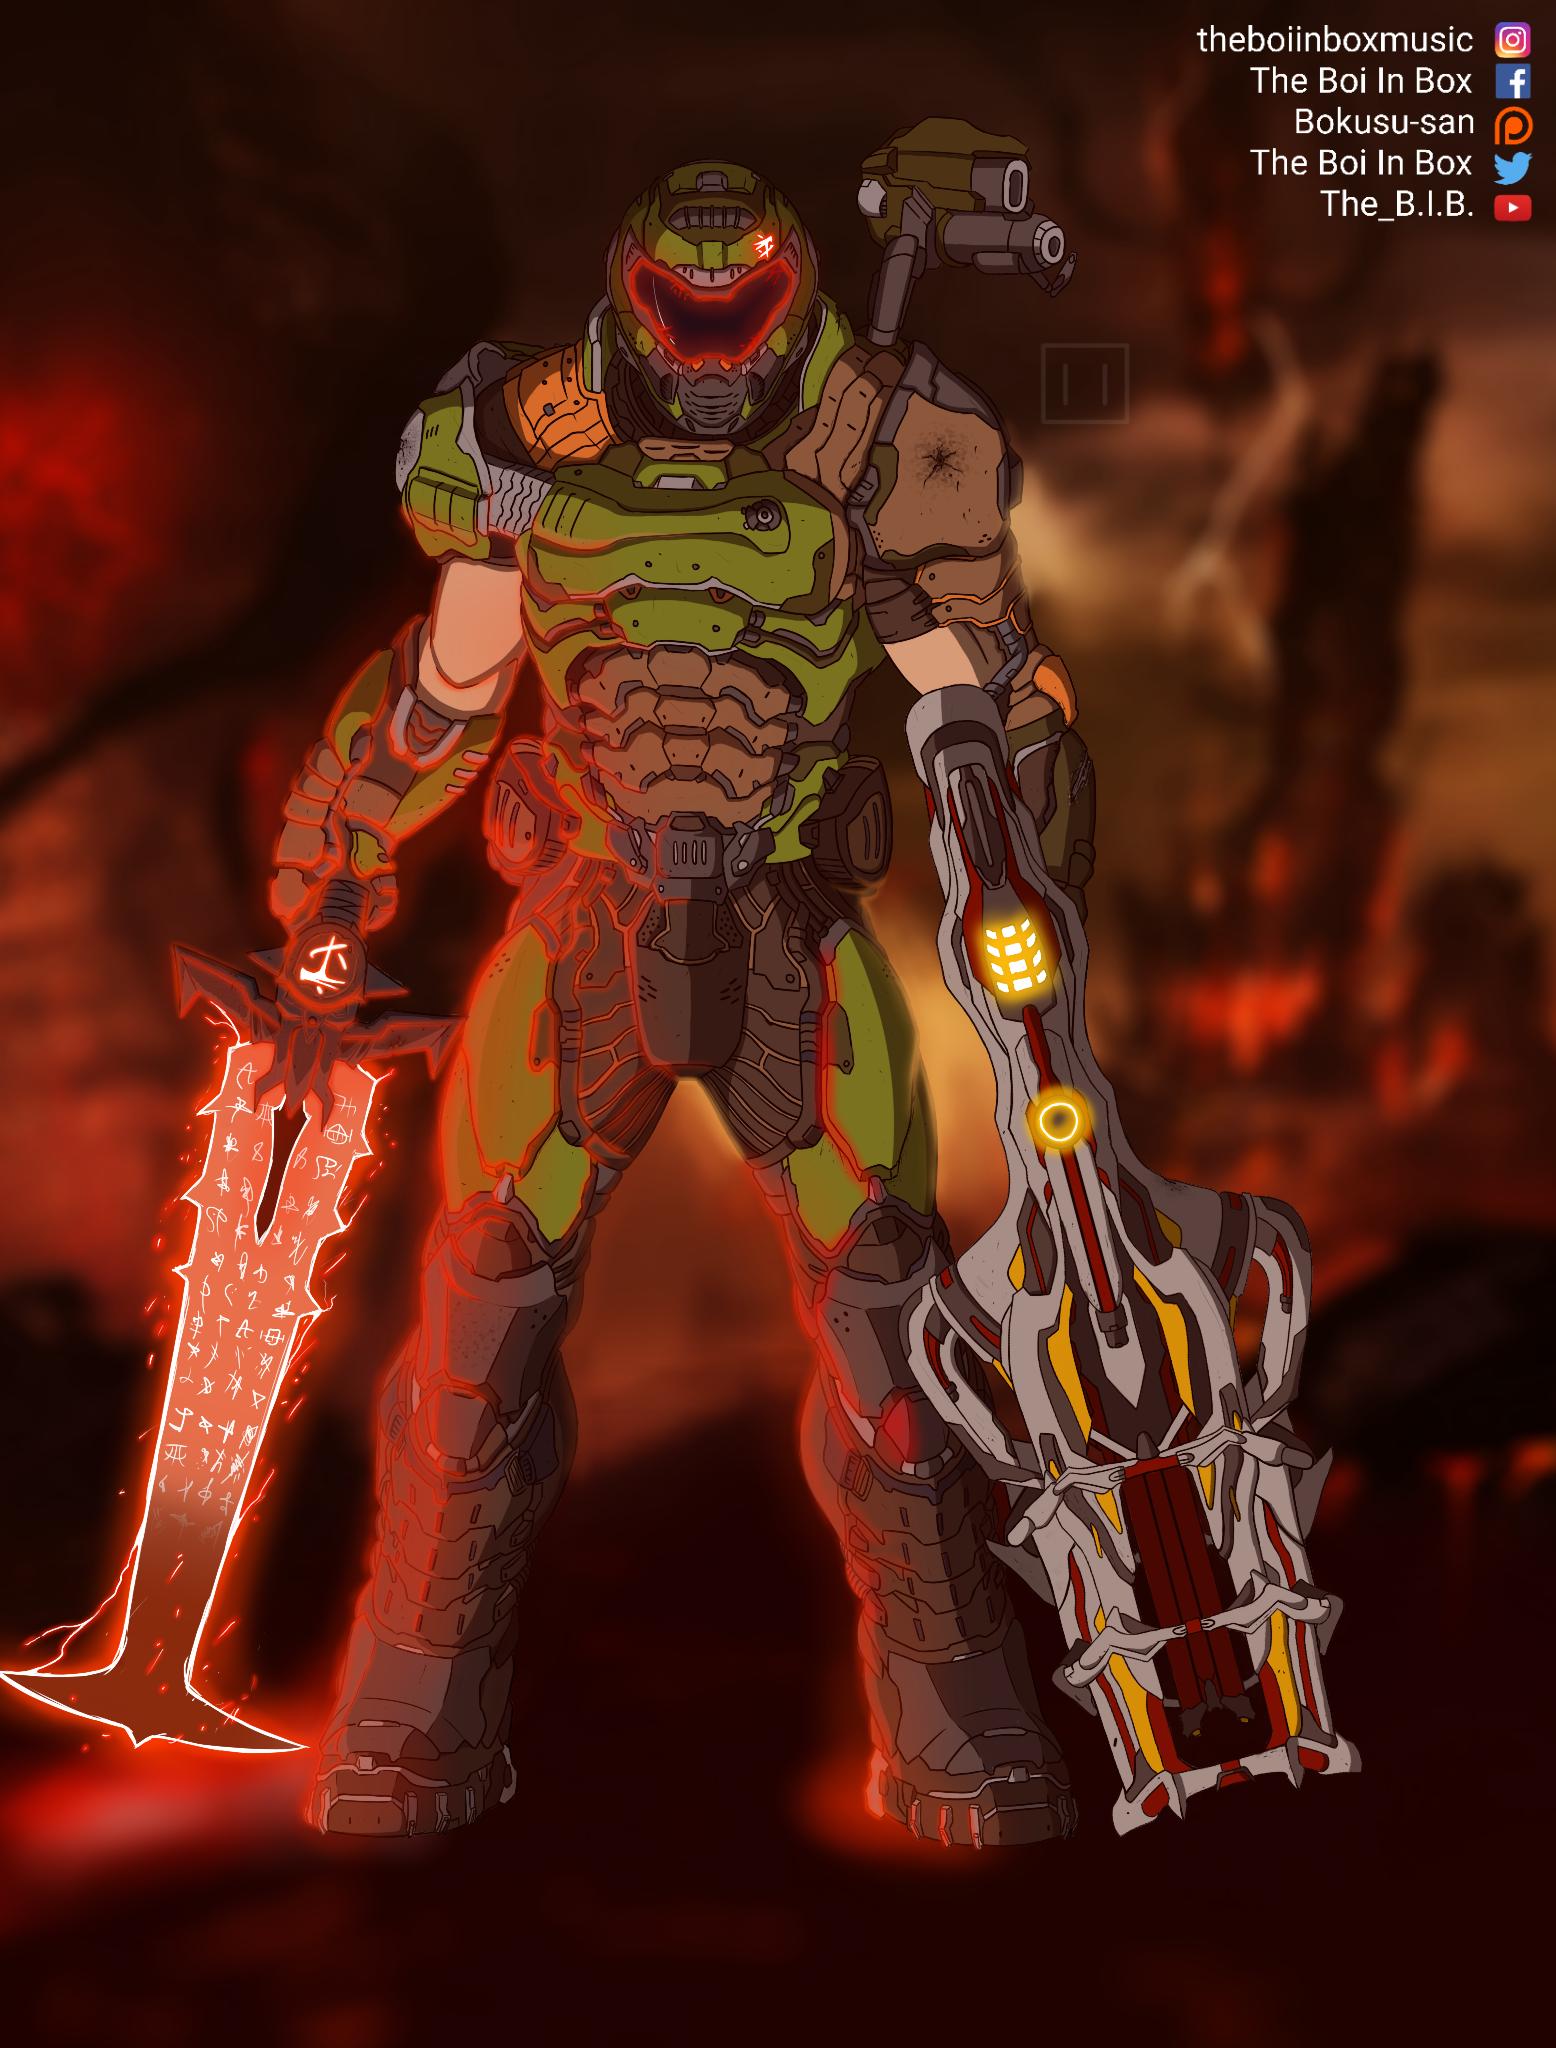 Doom Eternal Fan Art Doom Videogame Doom Slayer Meme